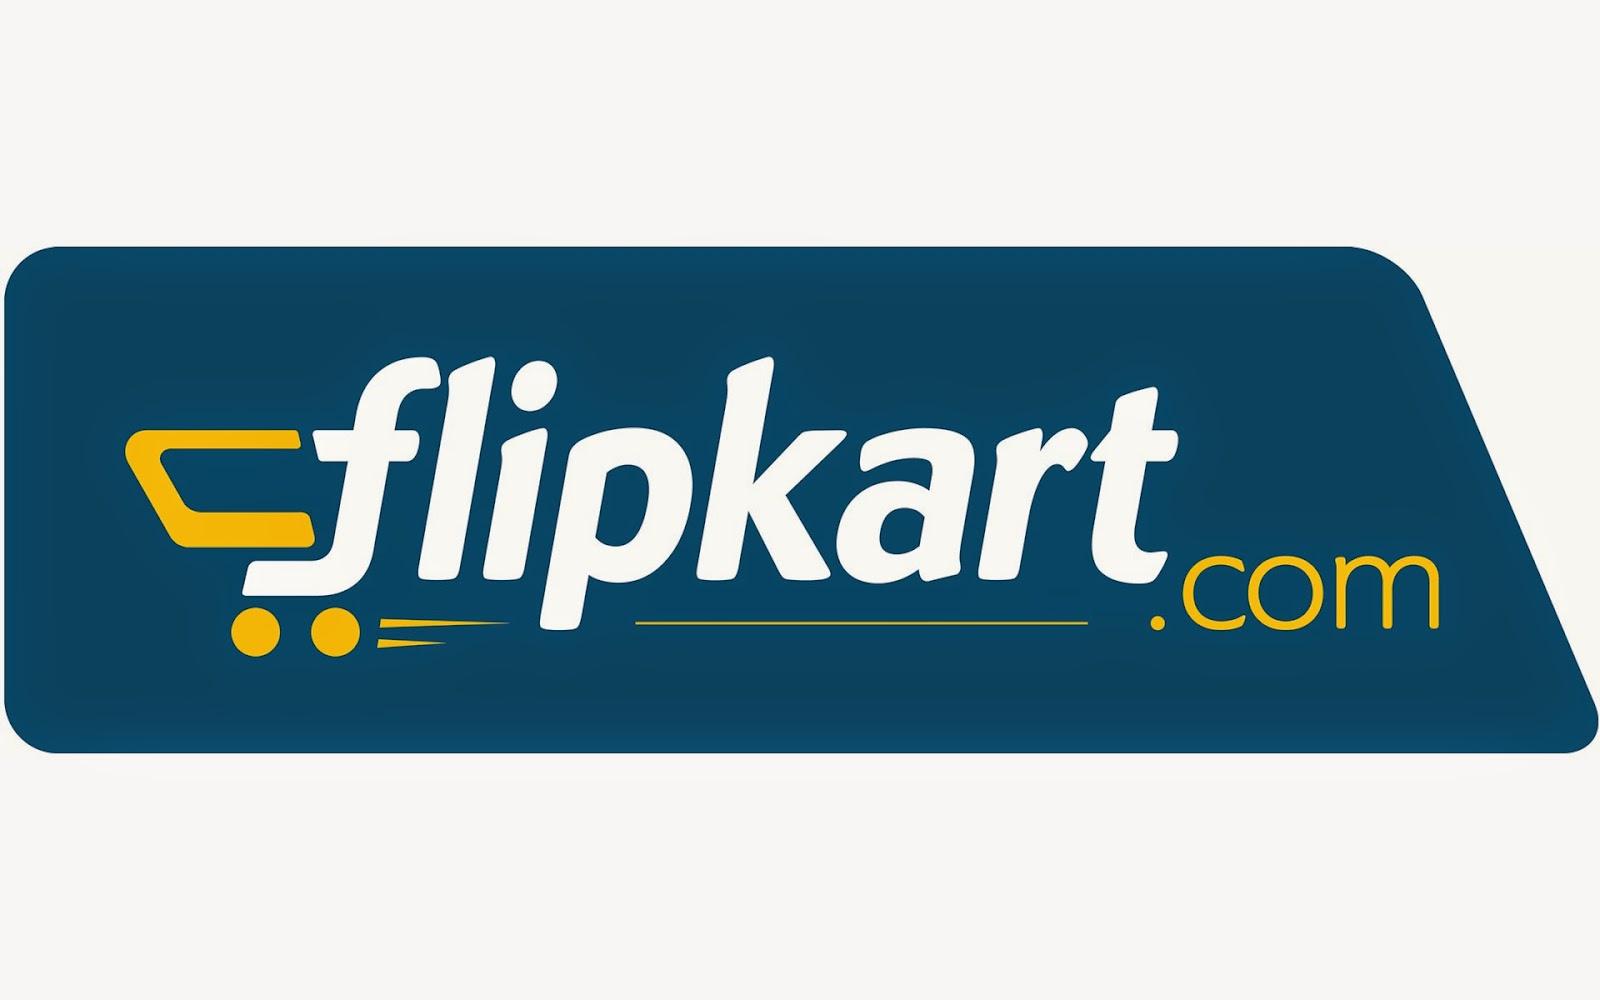 http://dl.flipkart.com/dl/home-decor/lights-lamps/bulbs/pr?sid=1m7%2Csat%2Cnmw&q=led+bulb&srno=po_0&allLinkPos=popular&affid=kheteshwa